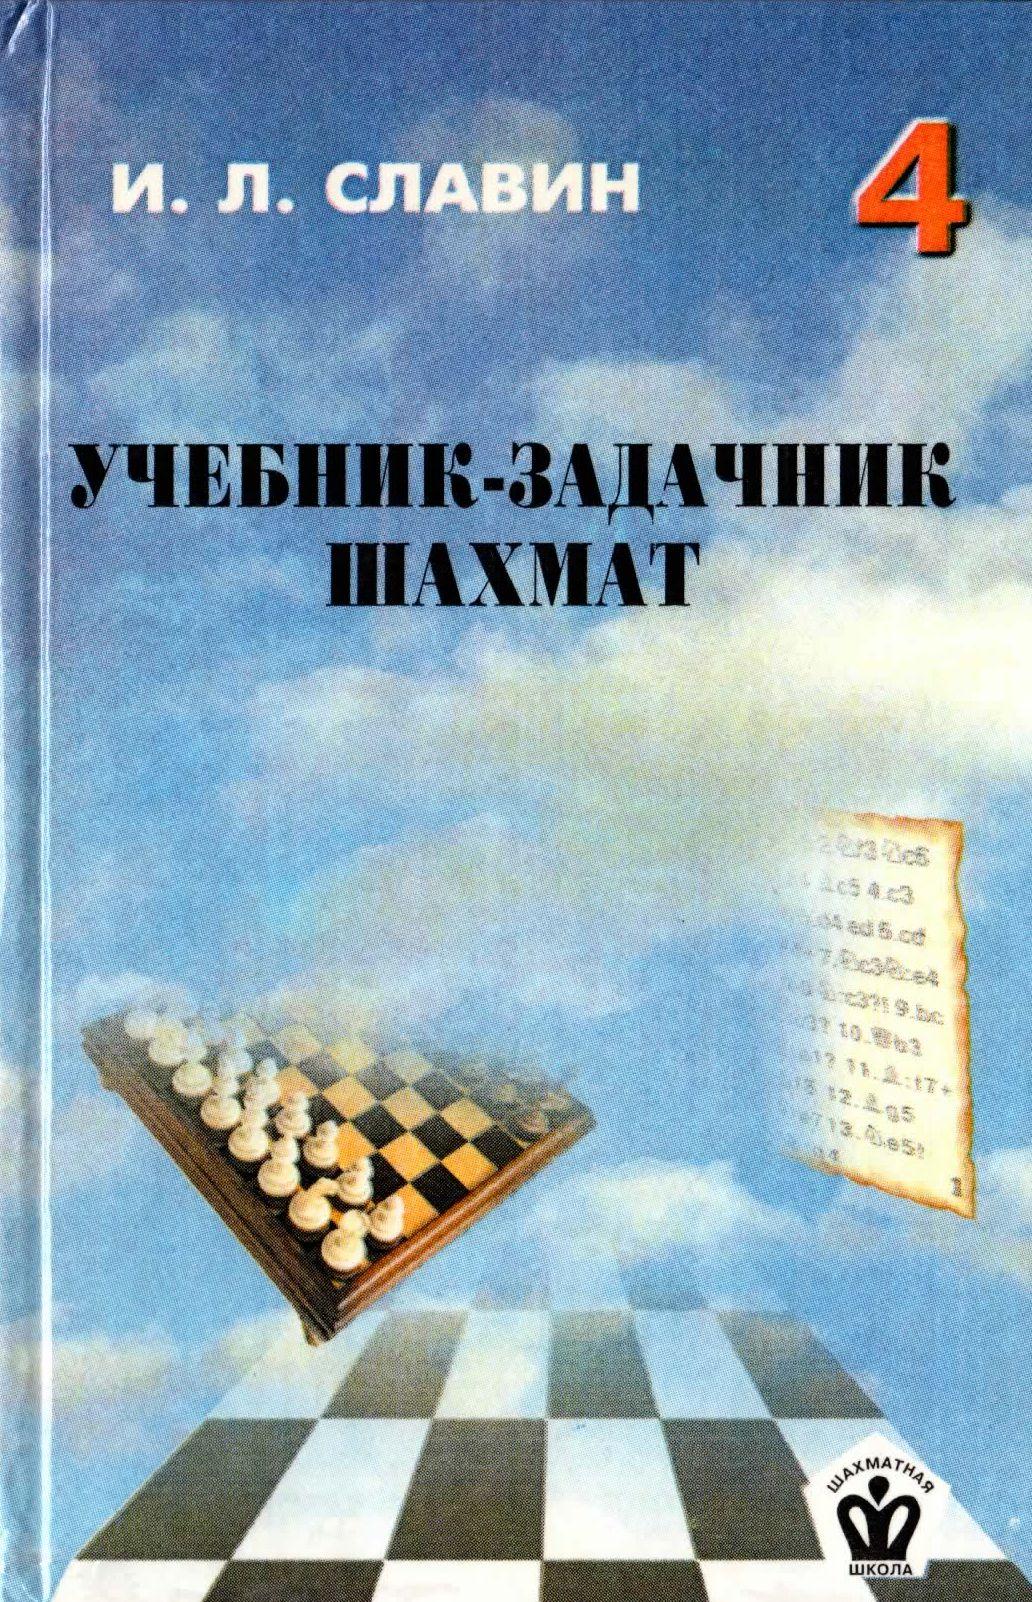 Учебник Задачник Шахмат Славин